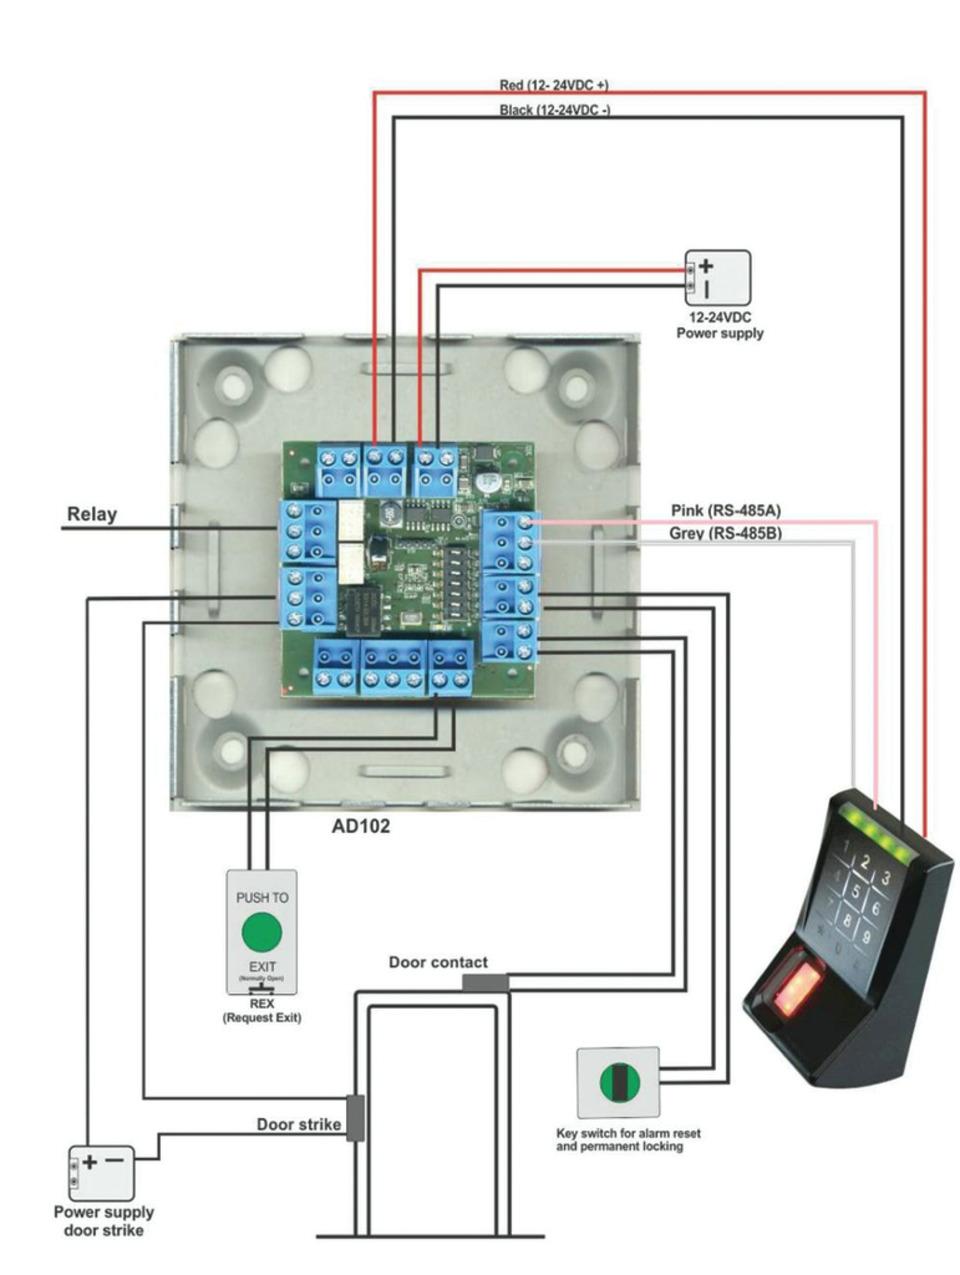 medium resolution of kaba wiring diagrams wiring diagramkaba ad102 kit opens the door to biometricsad102 kit operation diagram show